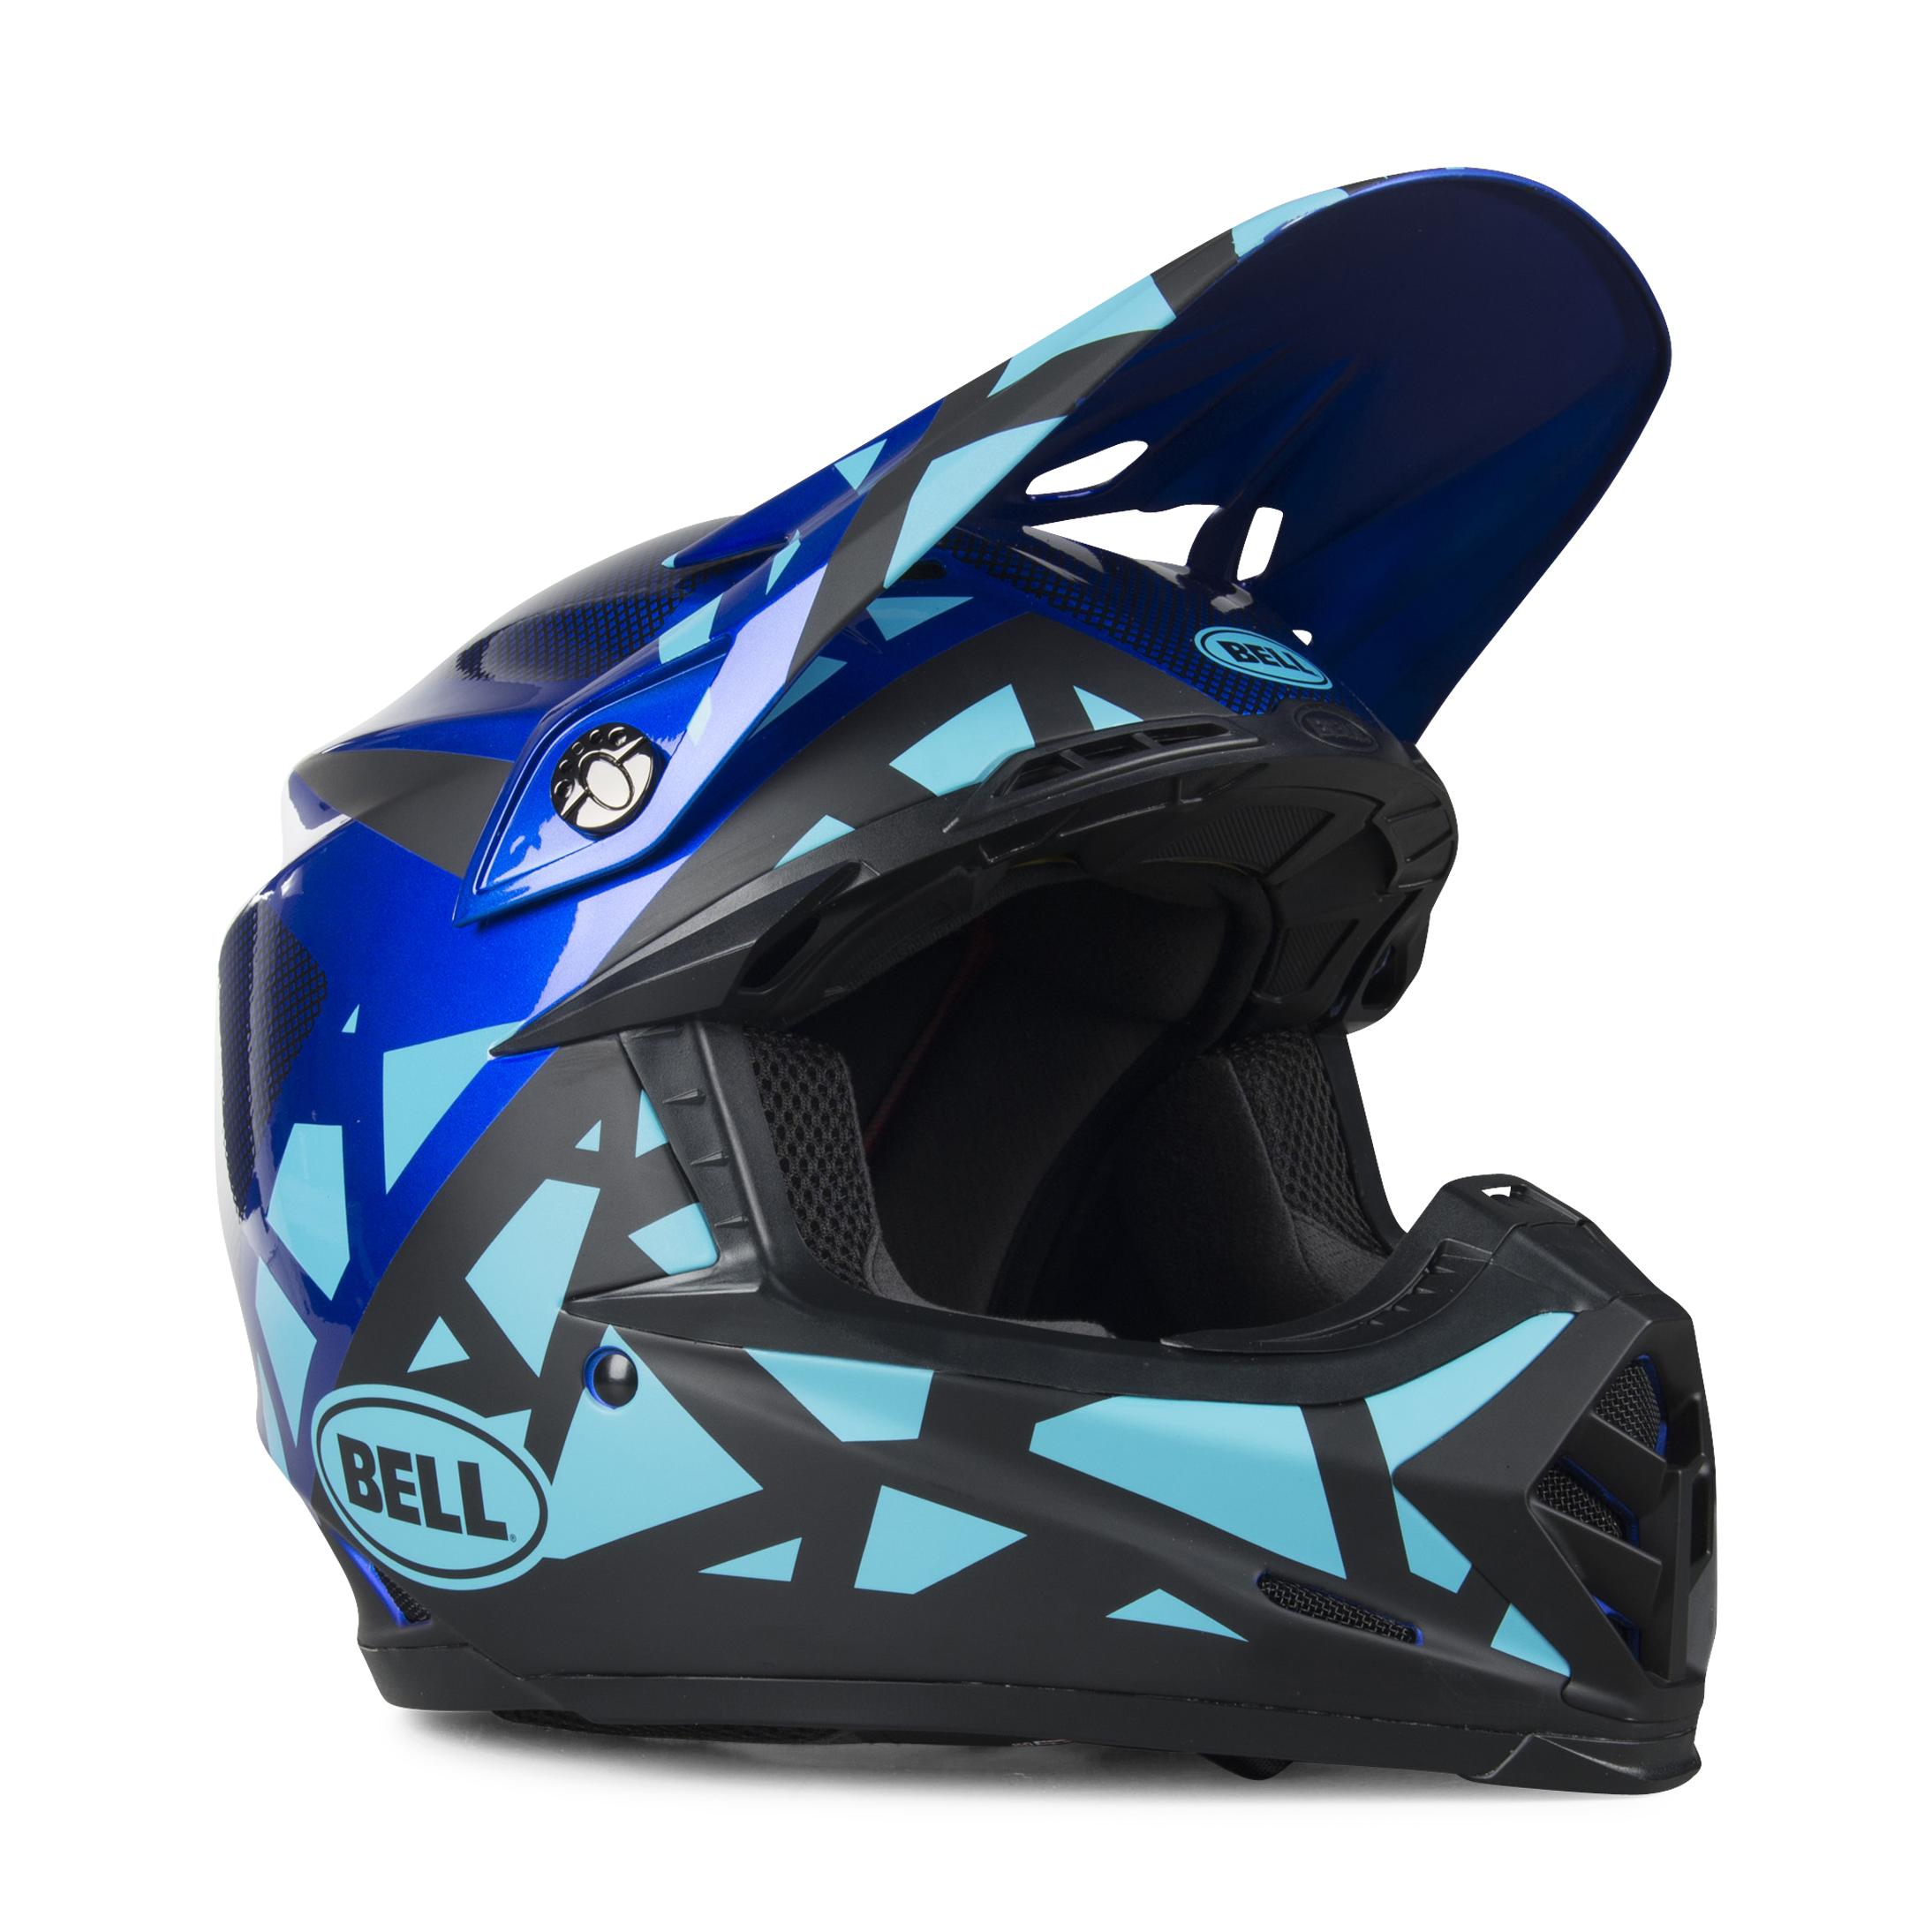 bell casco cross  moto-9 mips tremor blu-nero